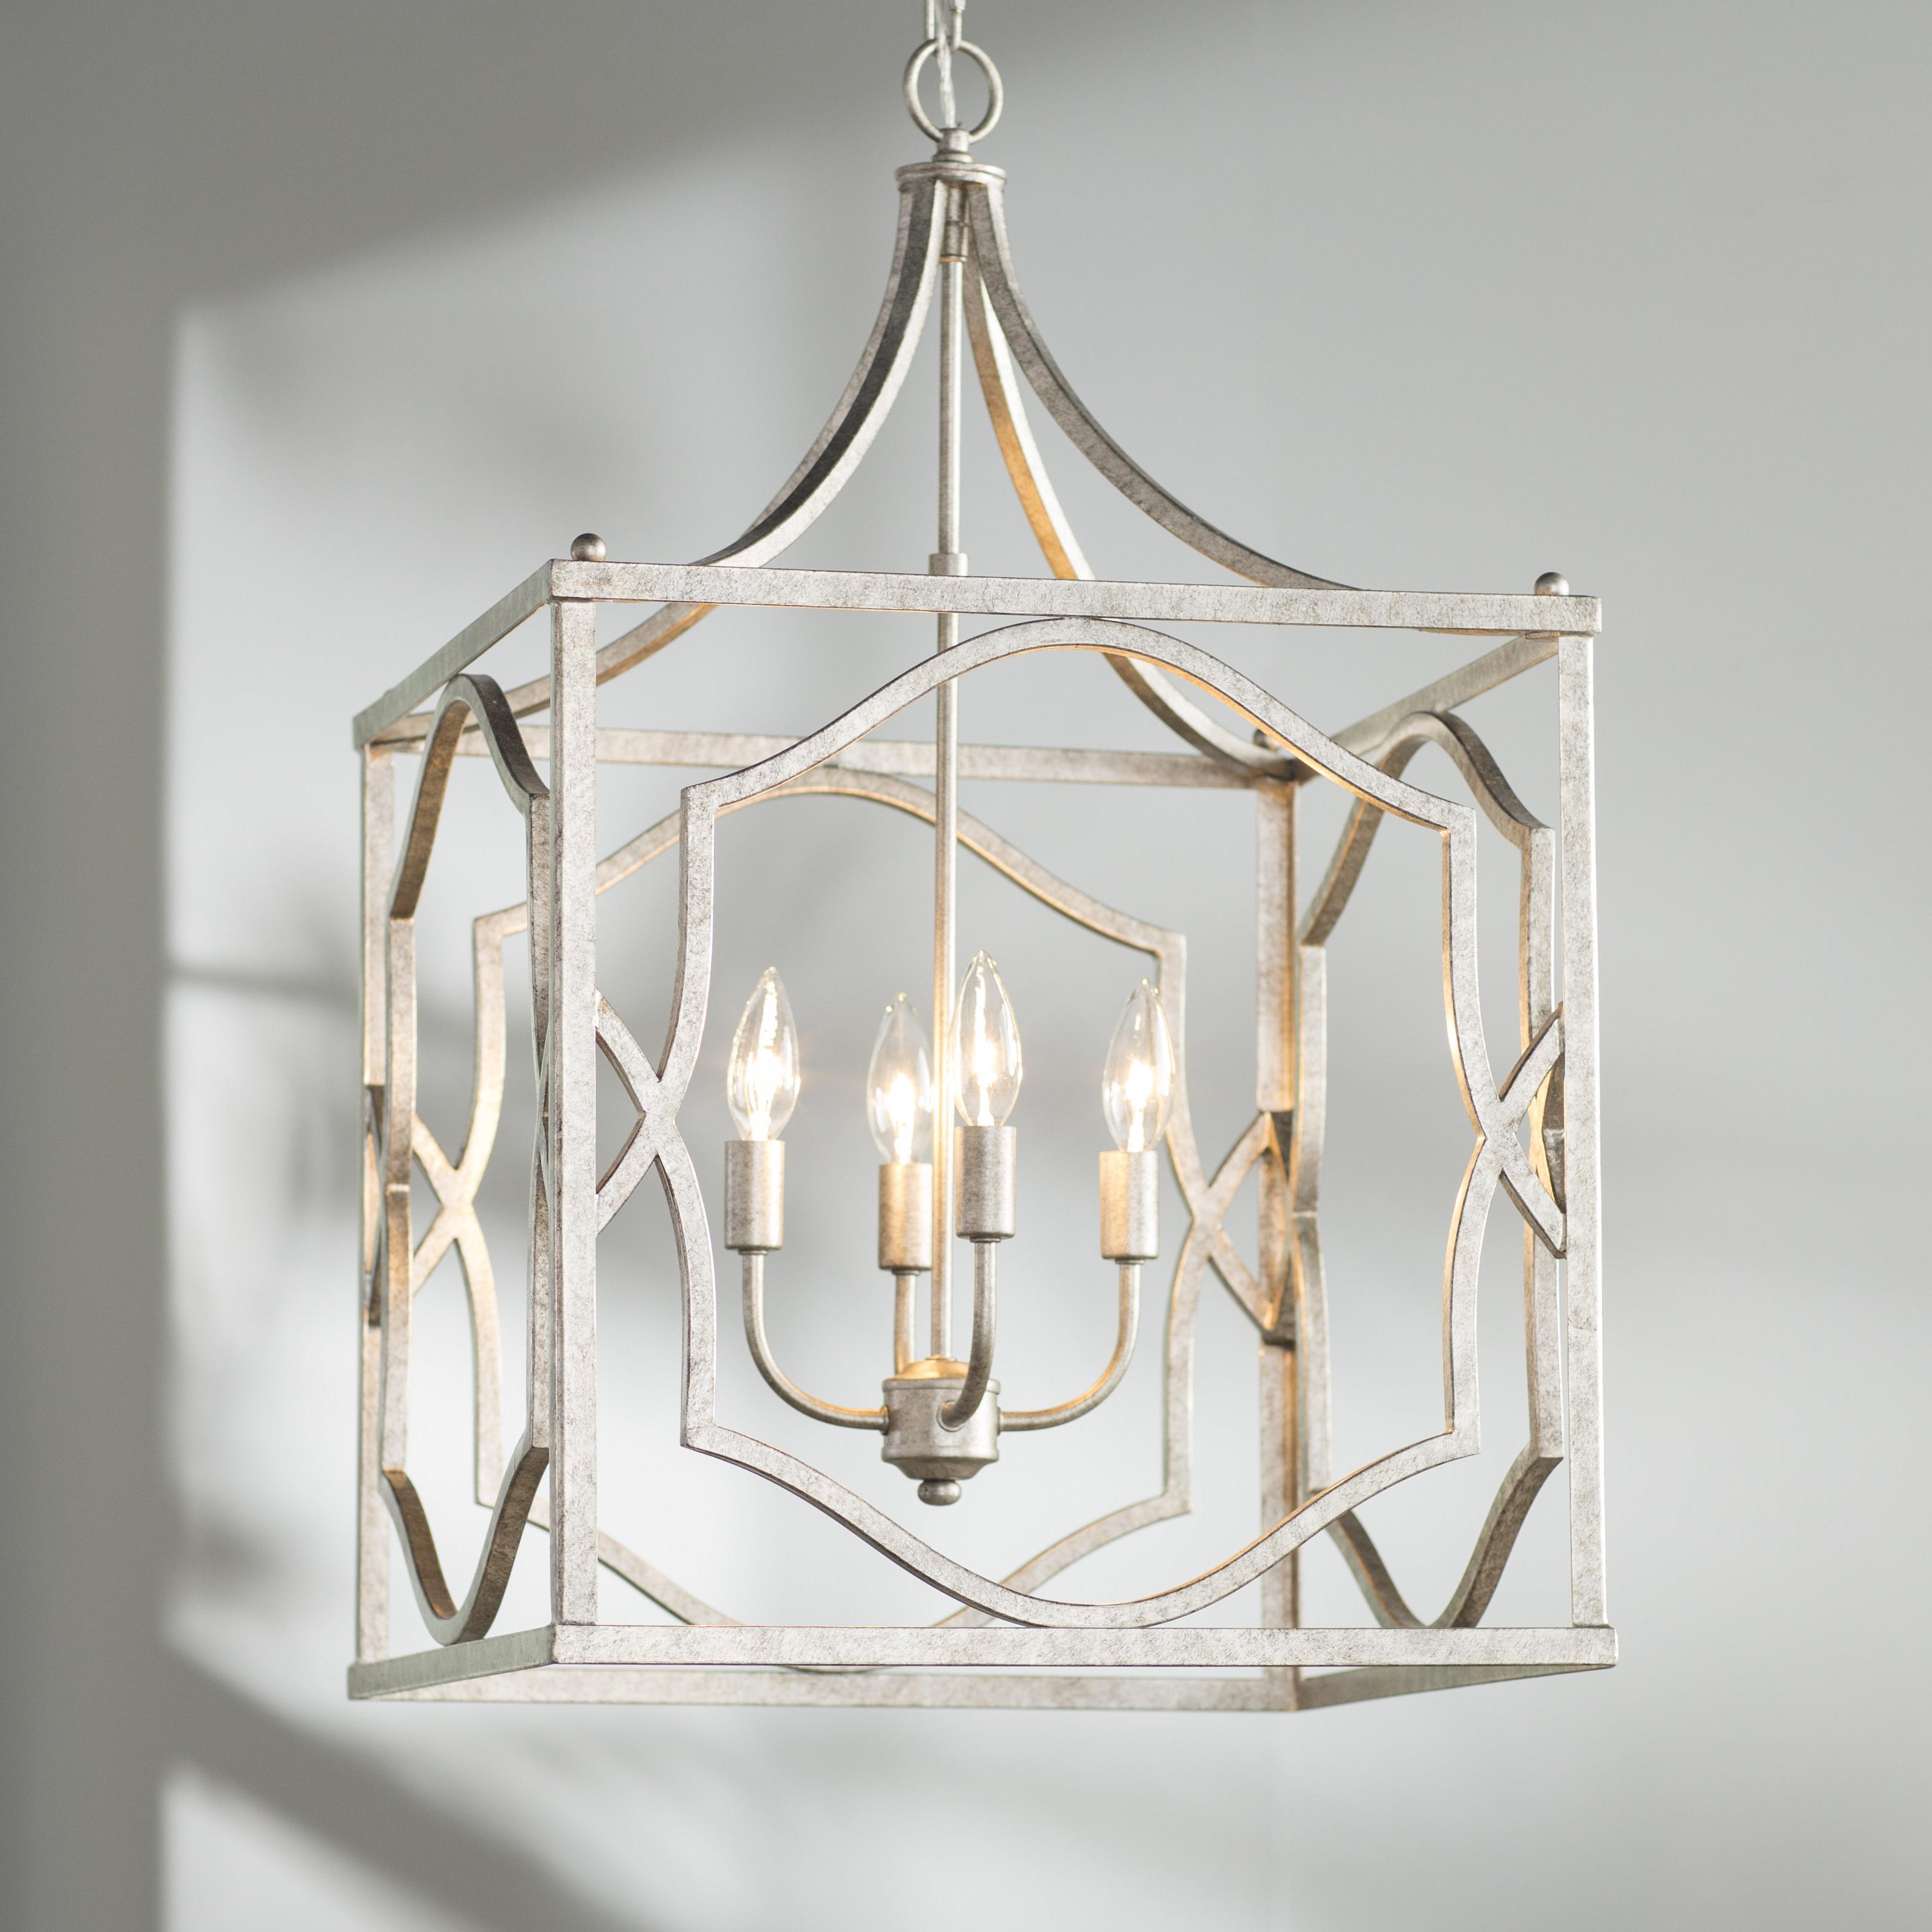 Destrey 3-Light Lantern Square/rectangle Pendants throughout Latest Destrey 4-Light Lantern Square / Rectangle Pendant